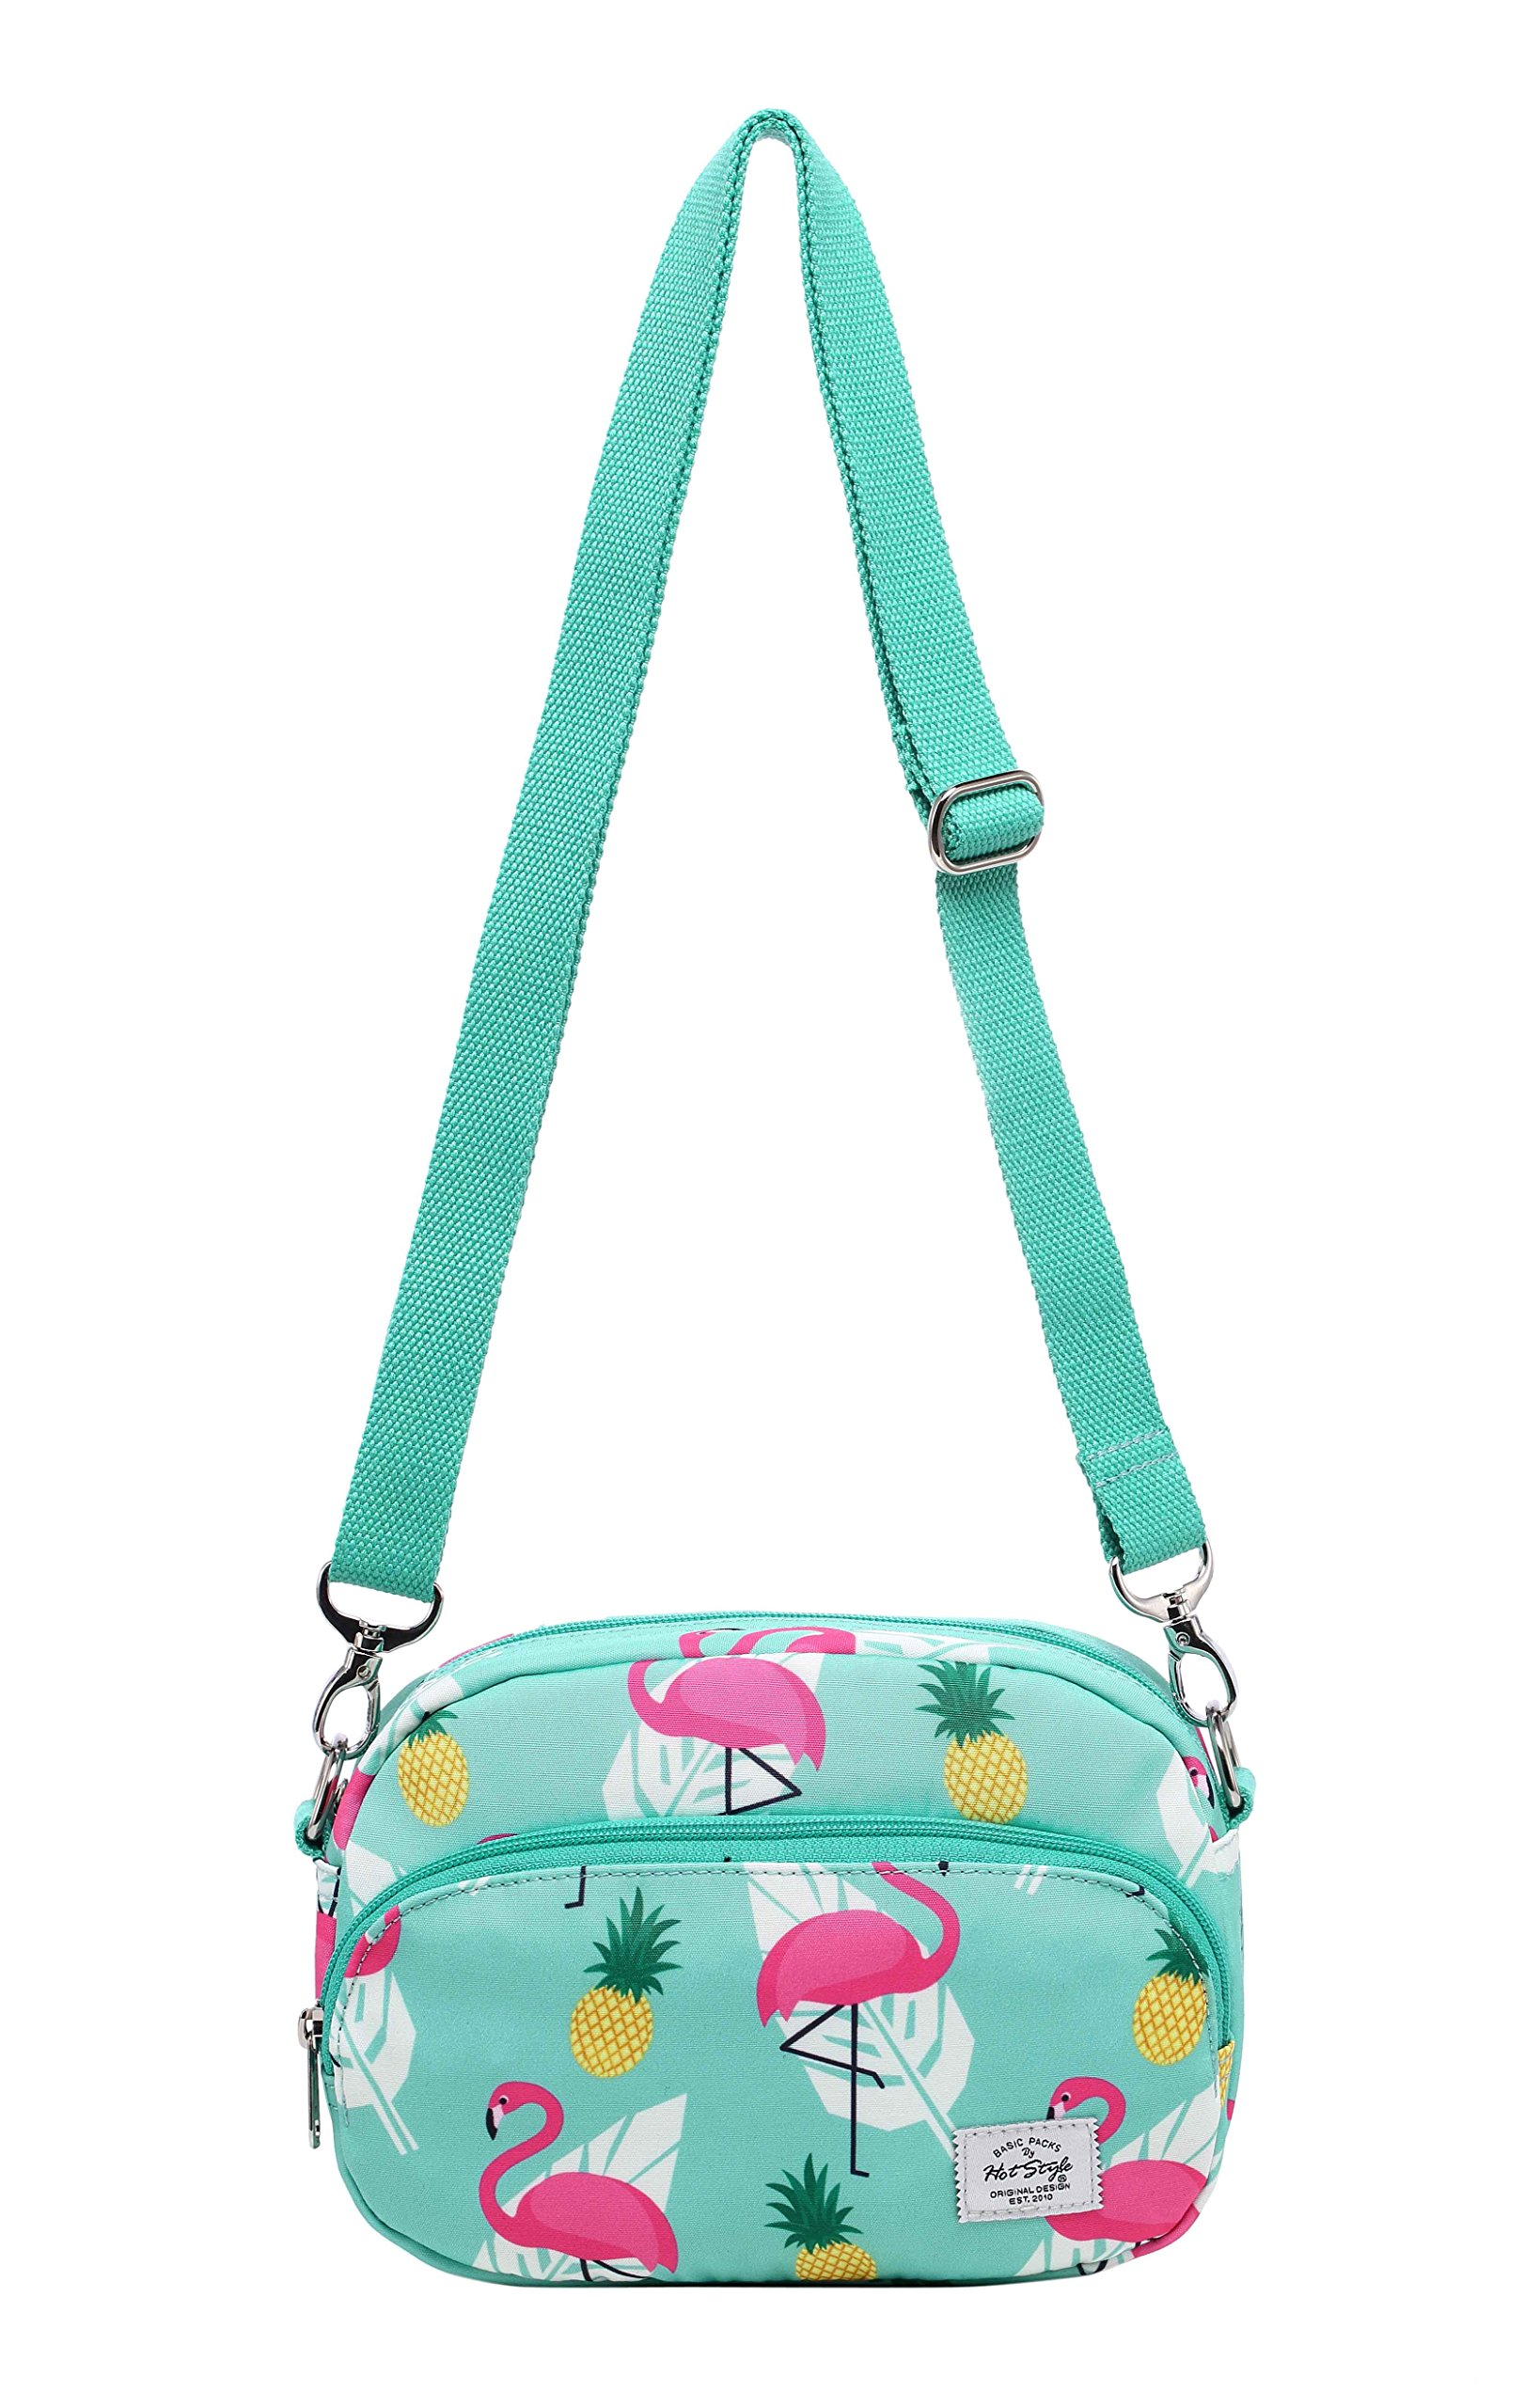 MIETTE Girls Small Crossbody Purse Cute Messenger Bag   8.6''x5.9''x1.8''   Flamingo, Mint